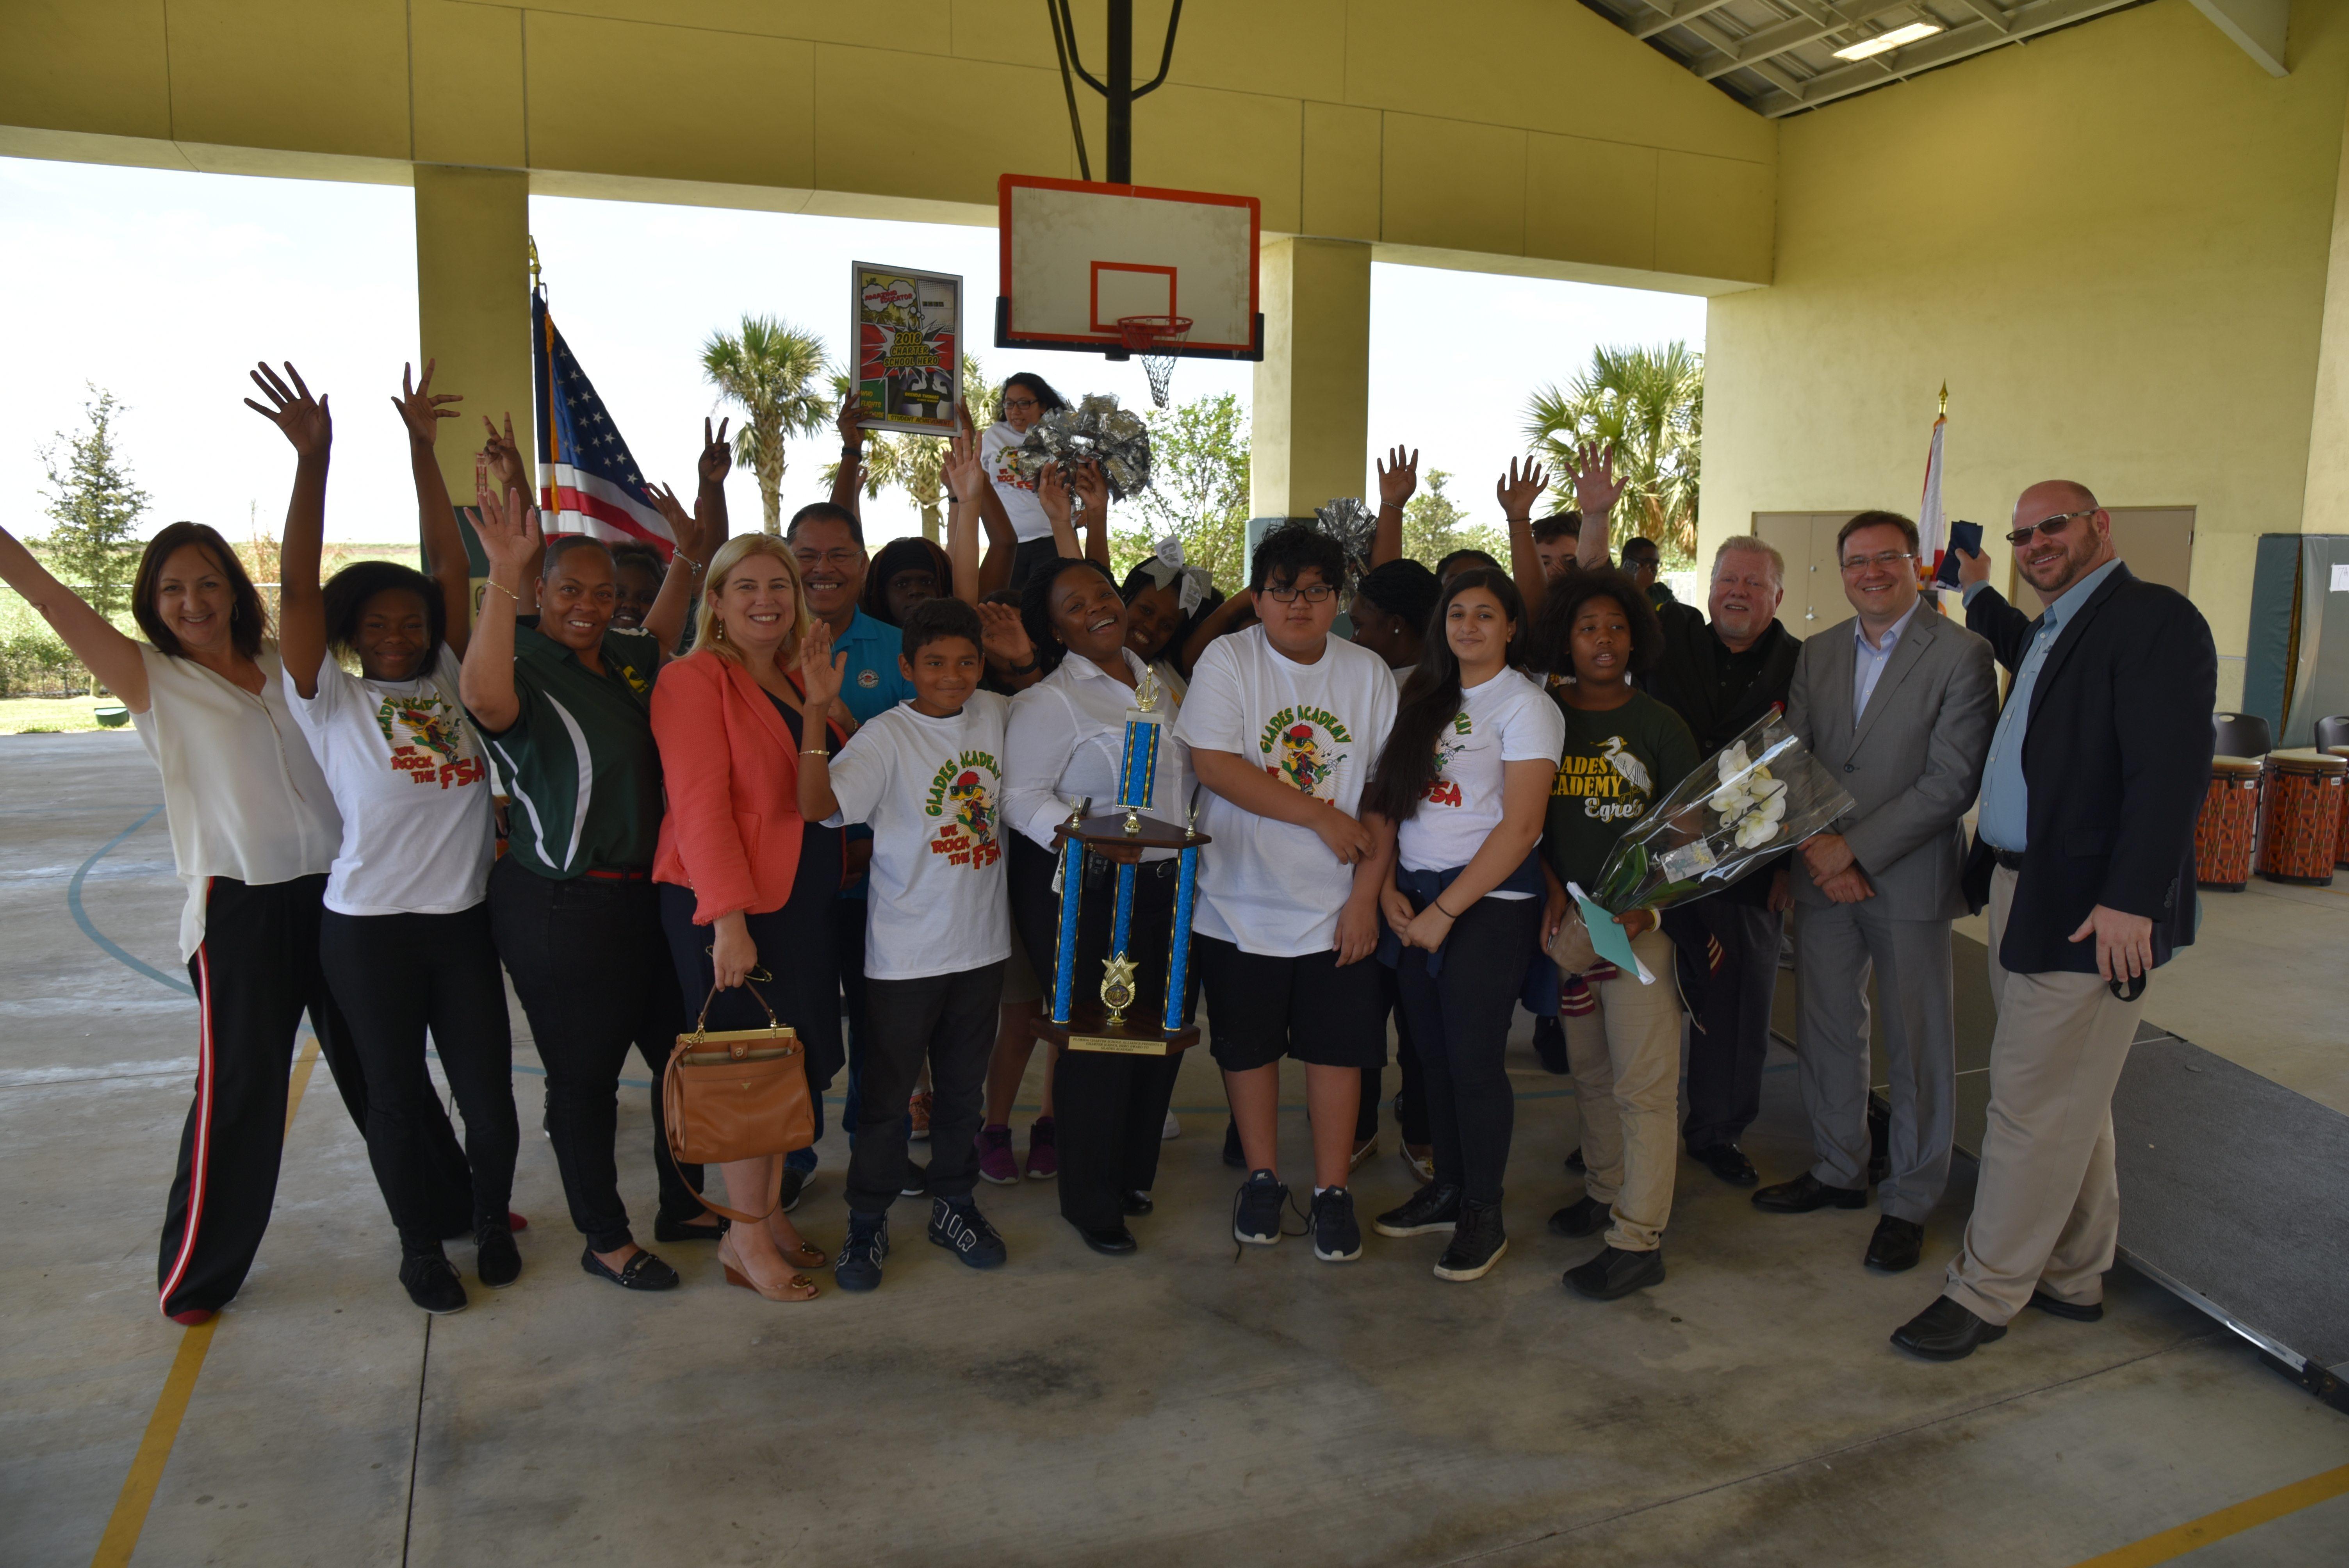 Charter Schools Week Celebrations recognize great schools, teachers, and principals